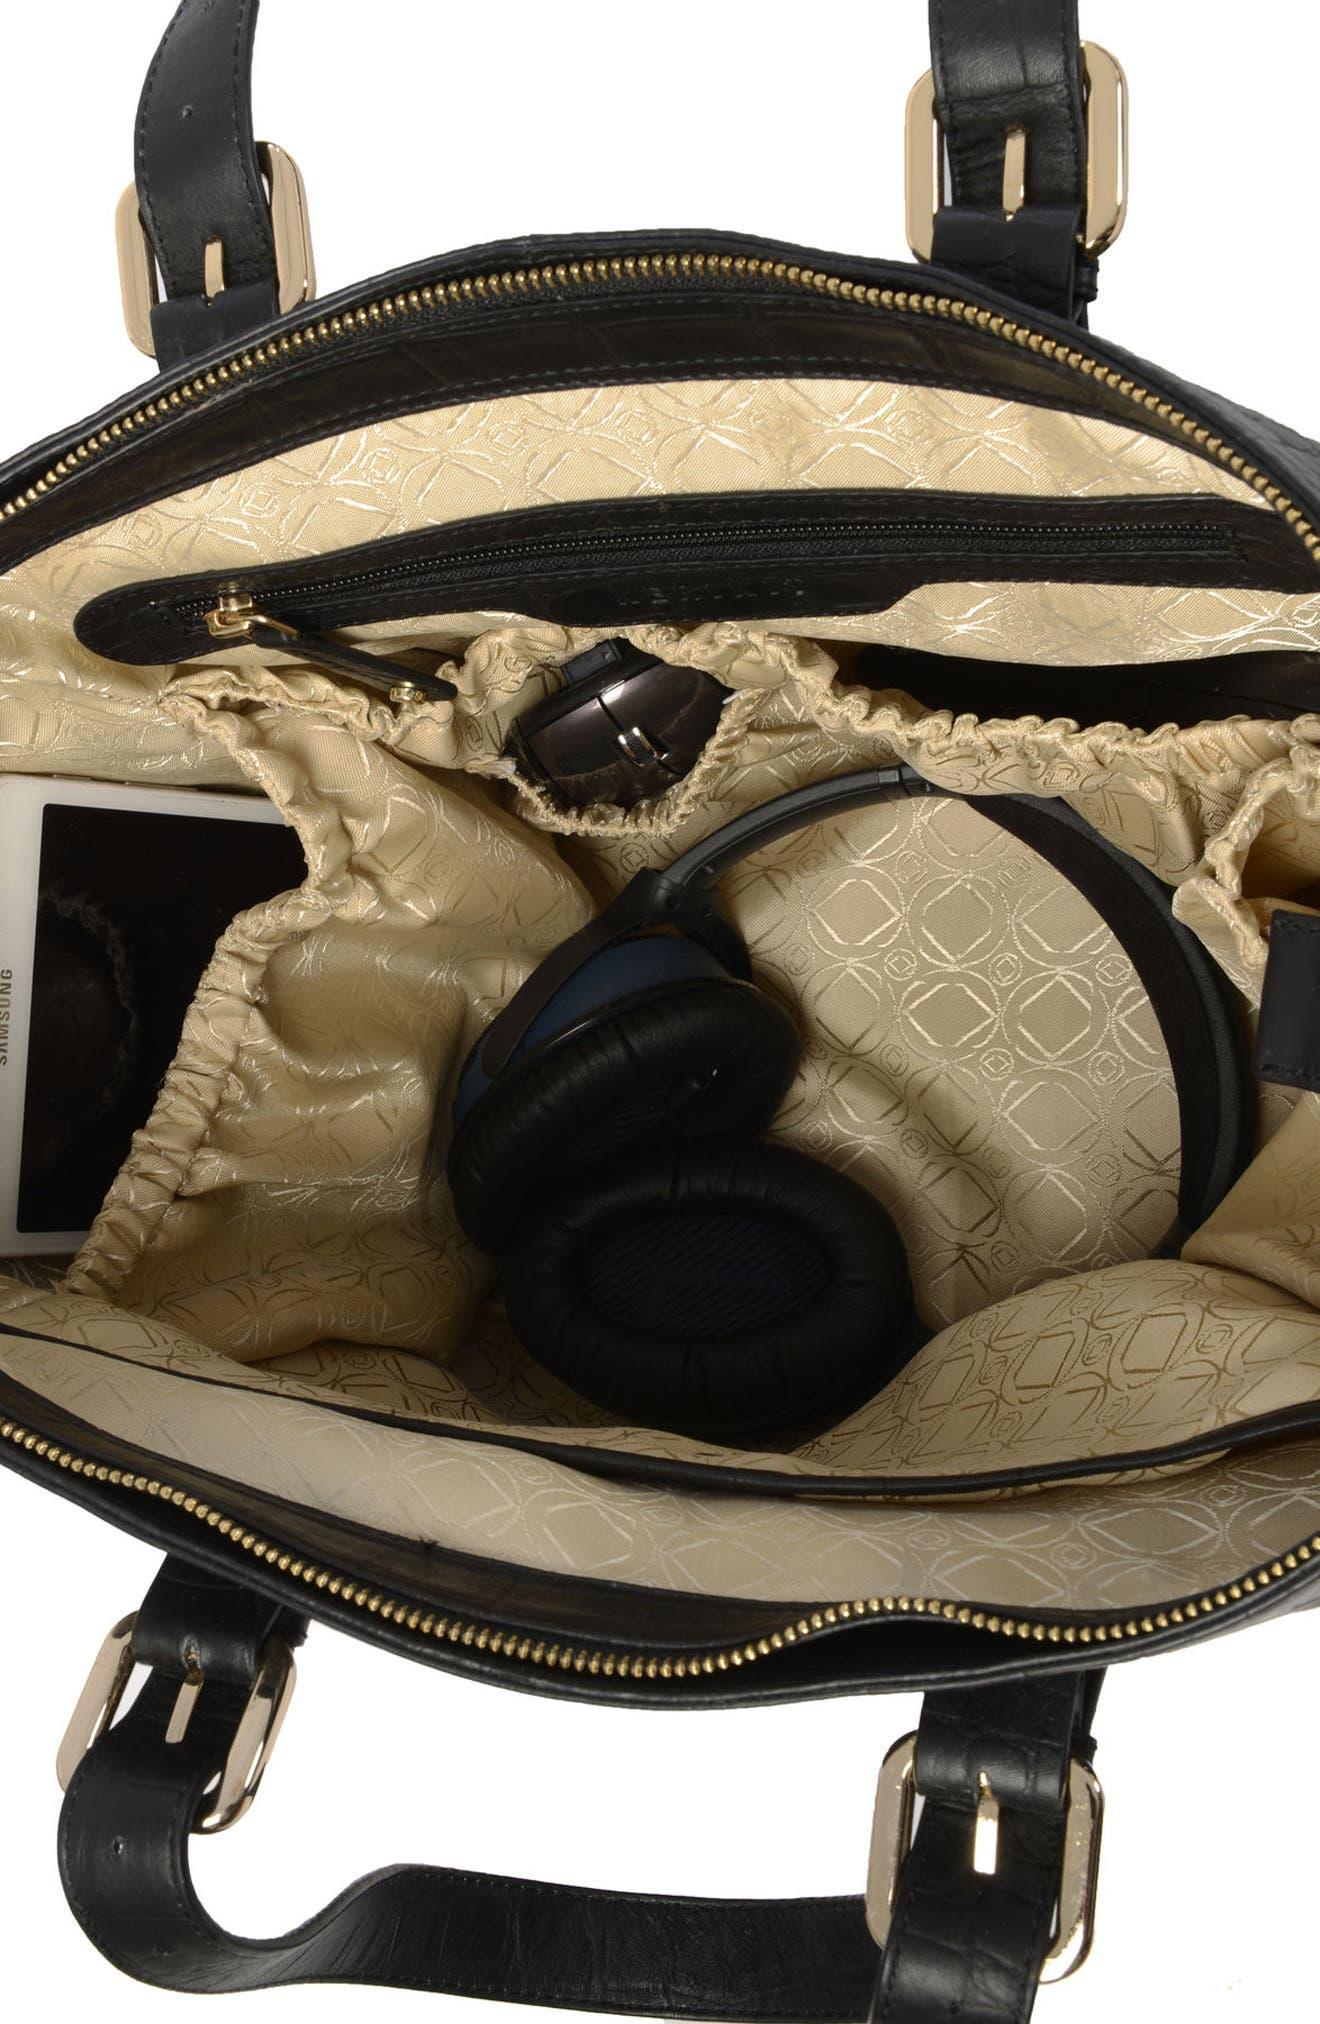 Francis Croc Embossed Leather Diaper Bag,                             Alternate thumbnail 8, color,                             001